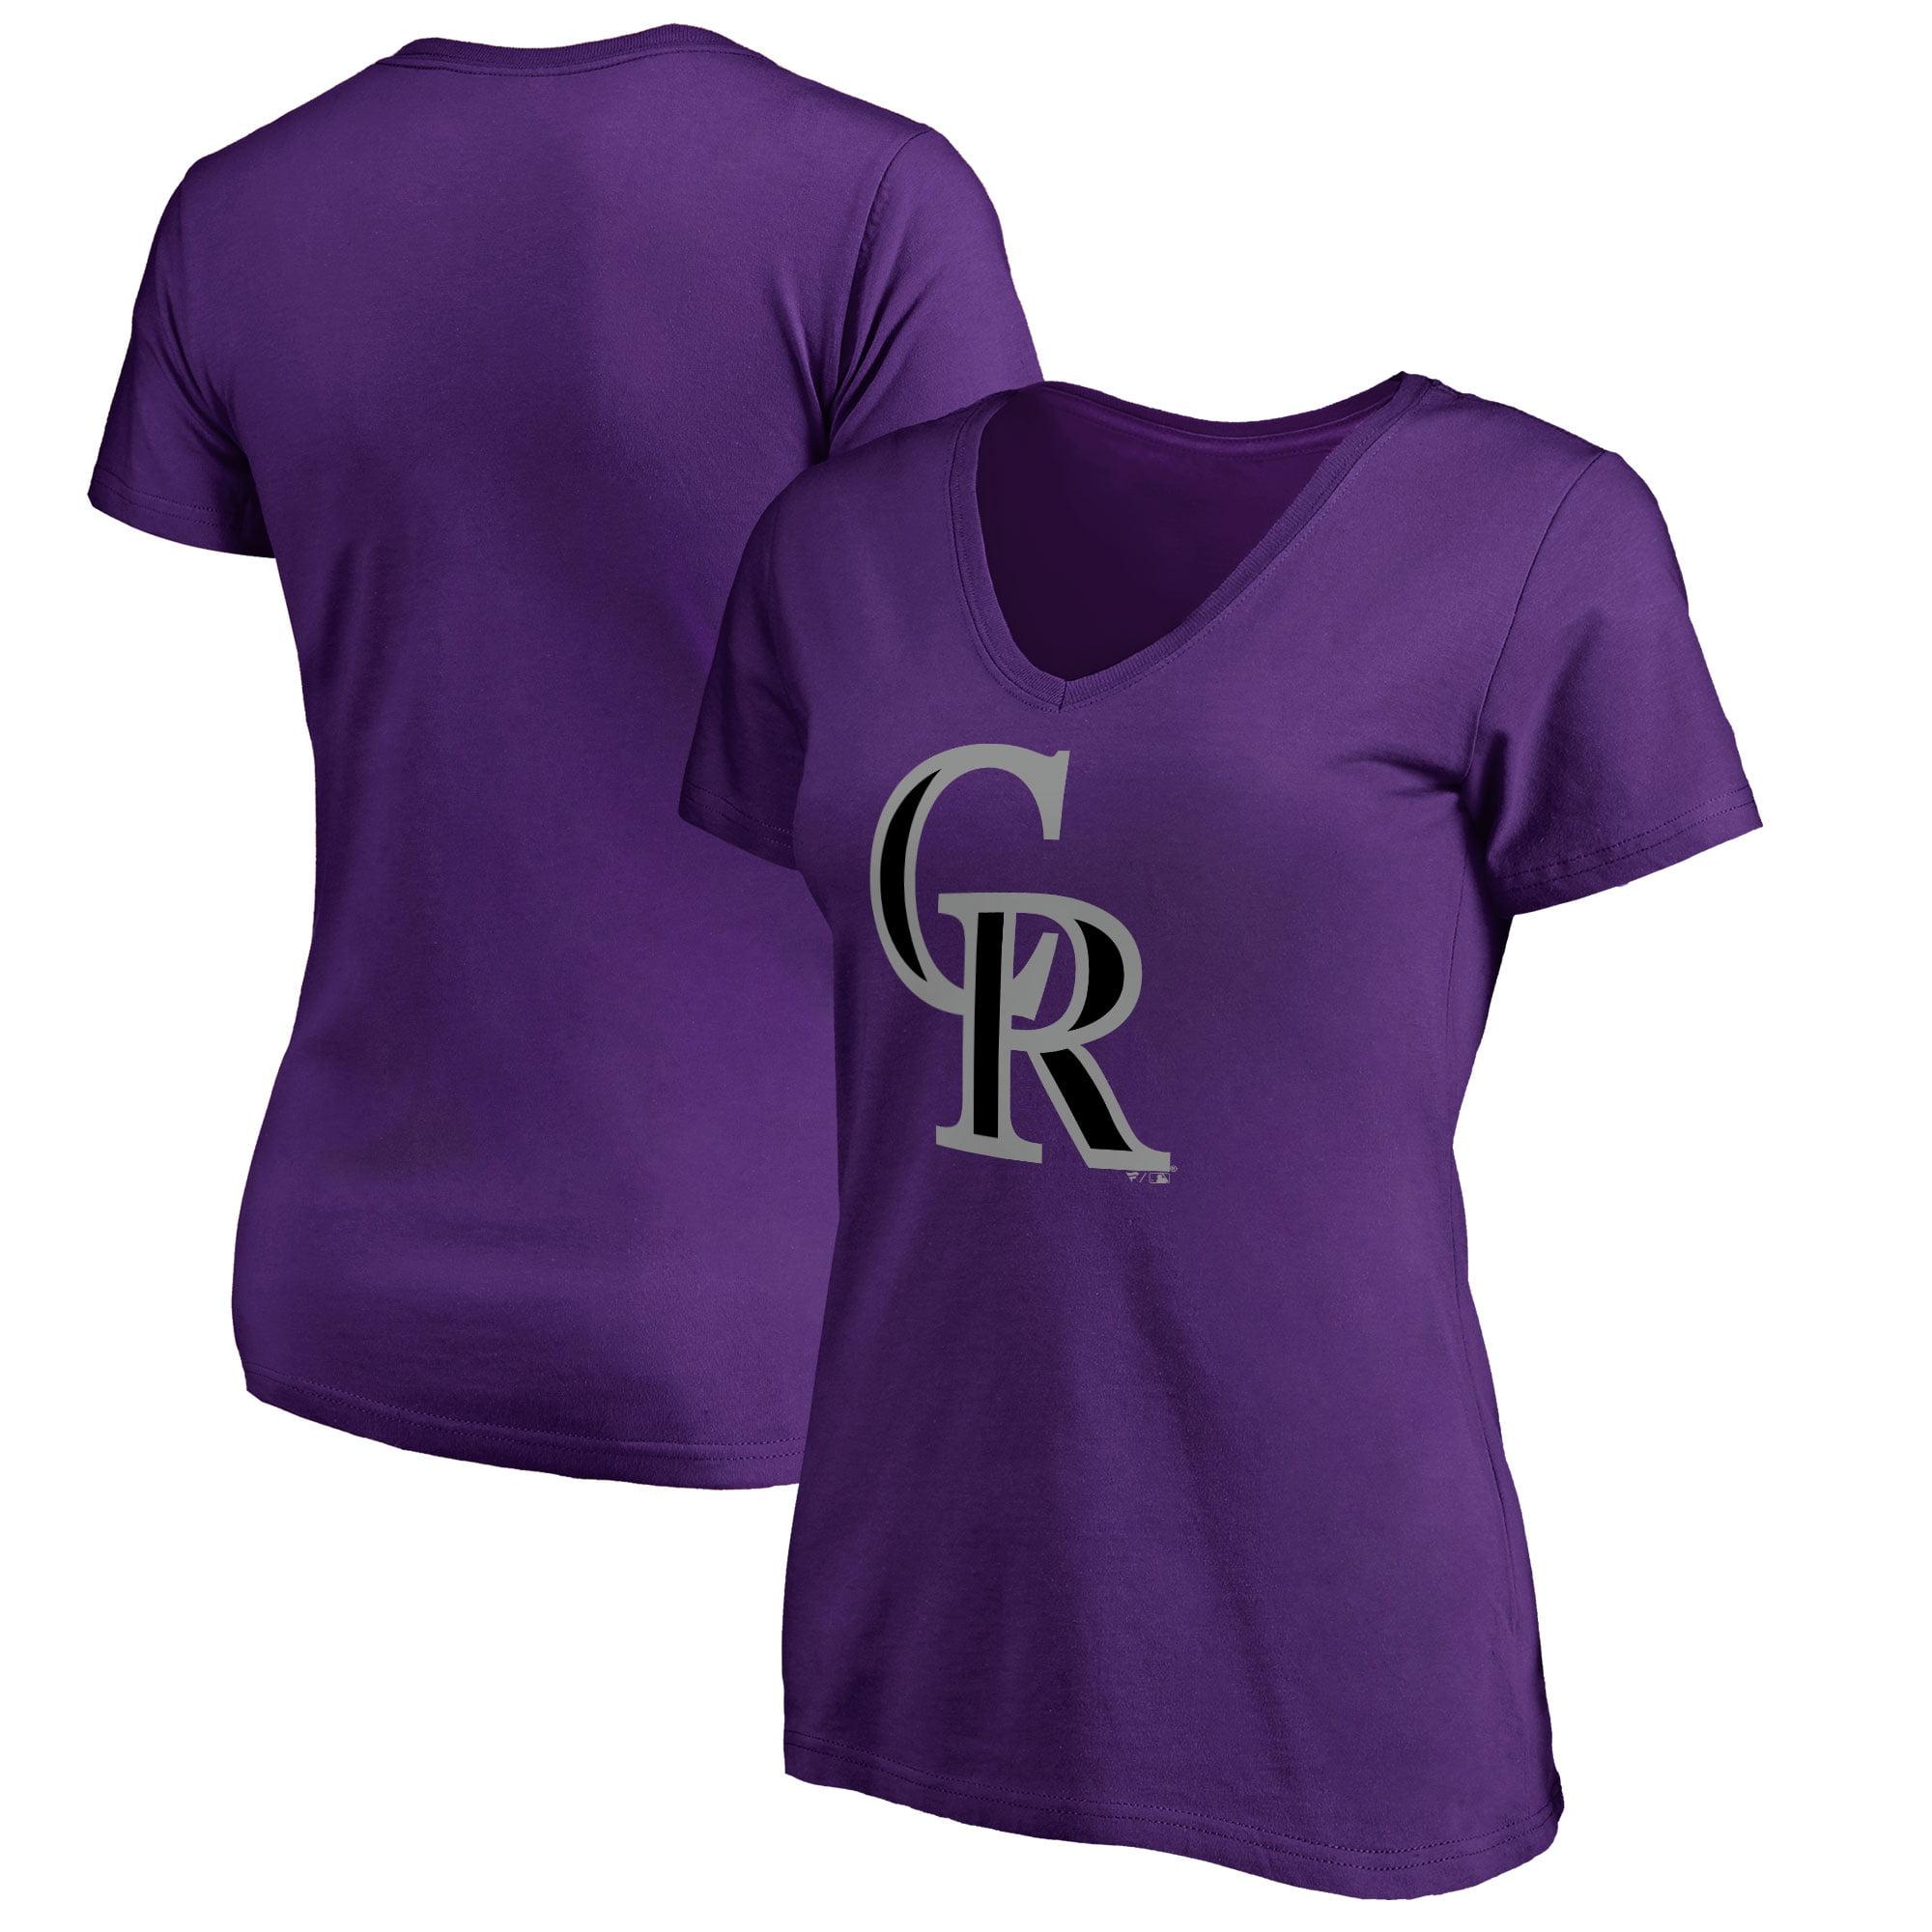 Colorado Rockies Women's Plus Sizes Primary Team Logo T-Shirt - Purple